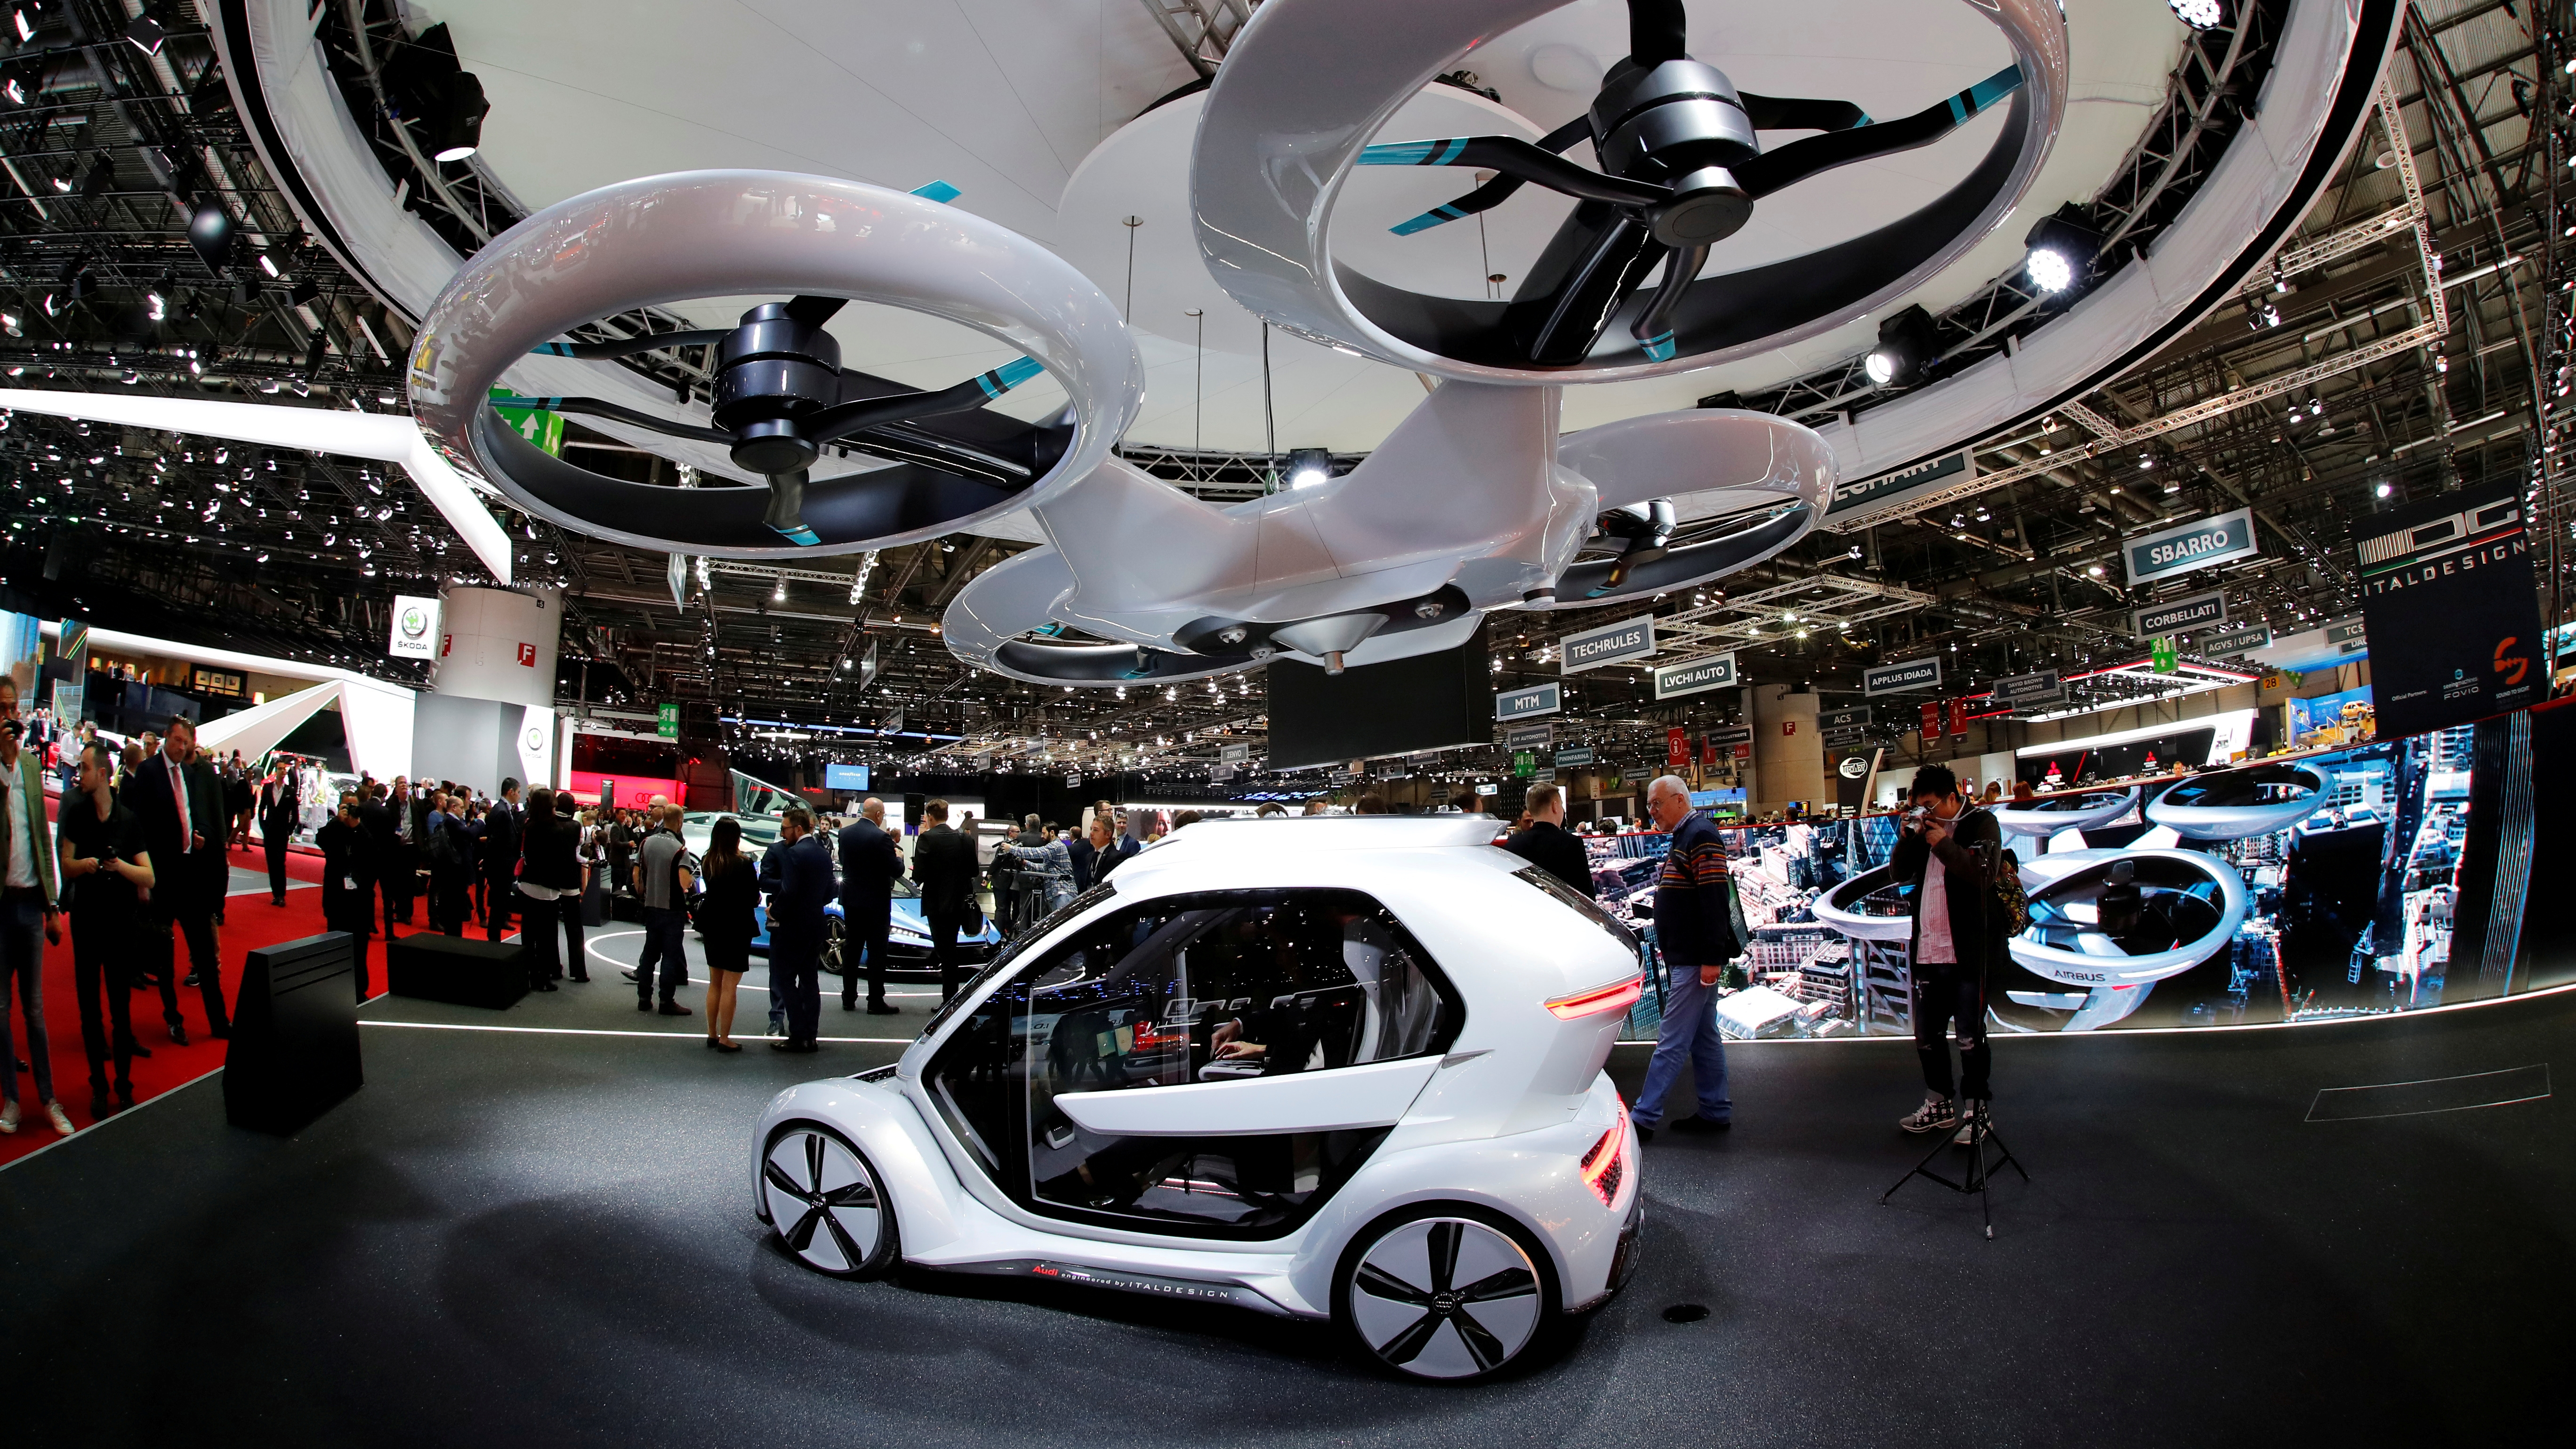 Porsche prevé tener tecnología para taxis voladores en una década